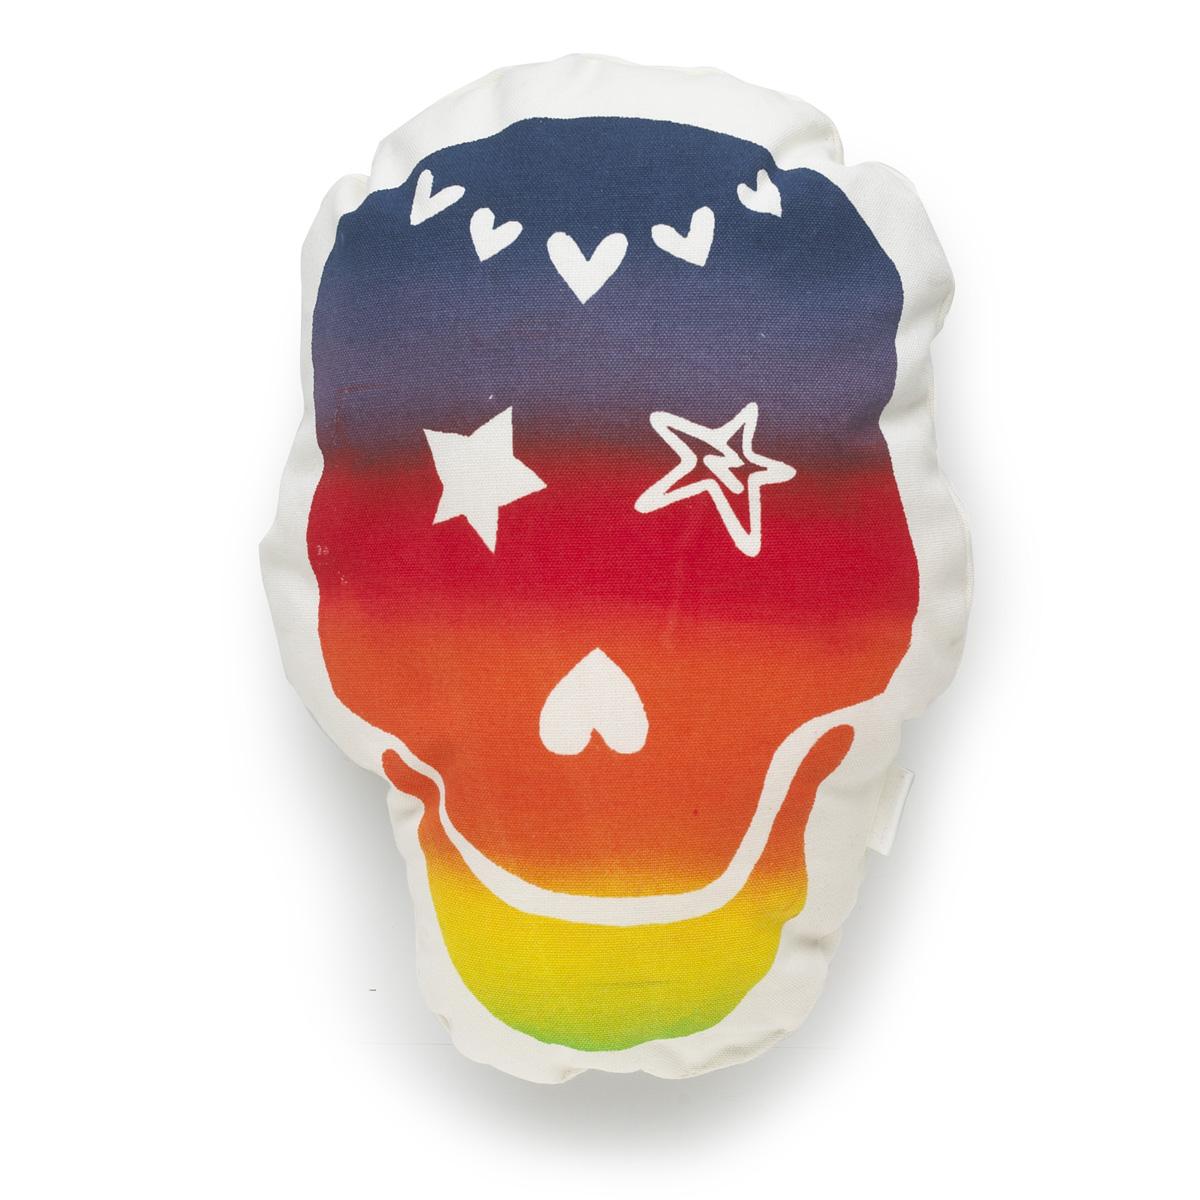 'Rainbow Love Skull' cushion, large and small